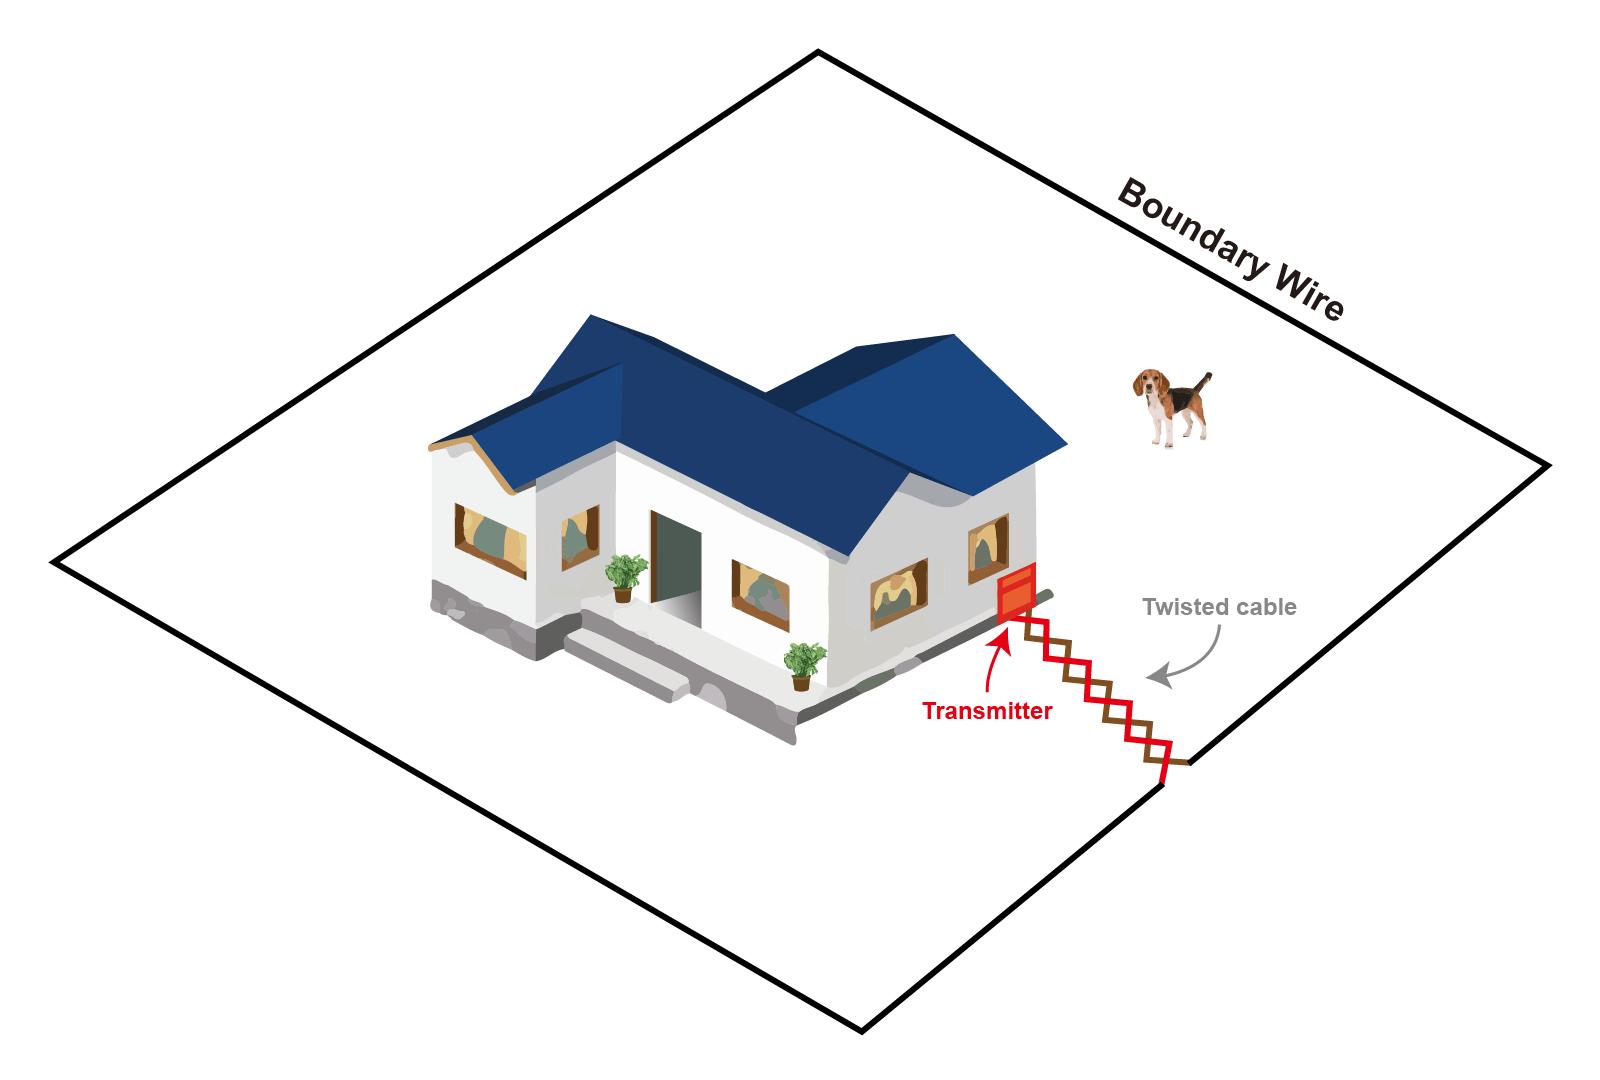 hight resolution of whole yard perimeter